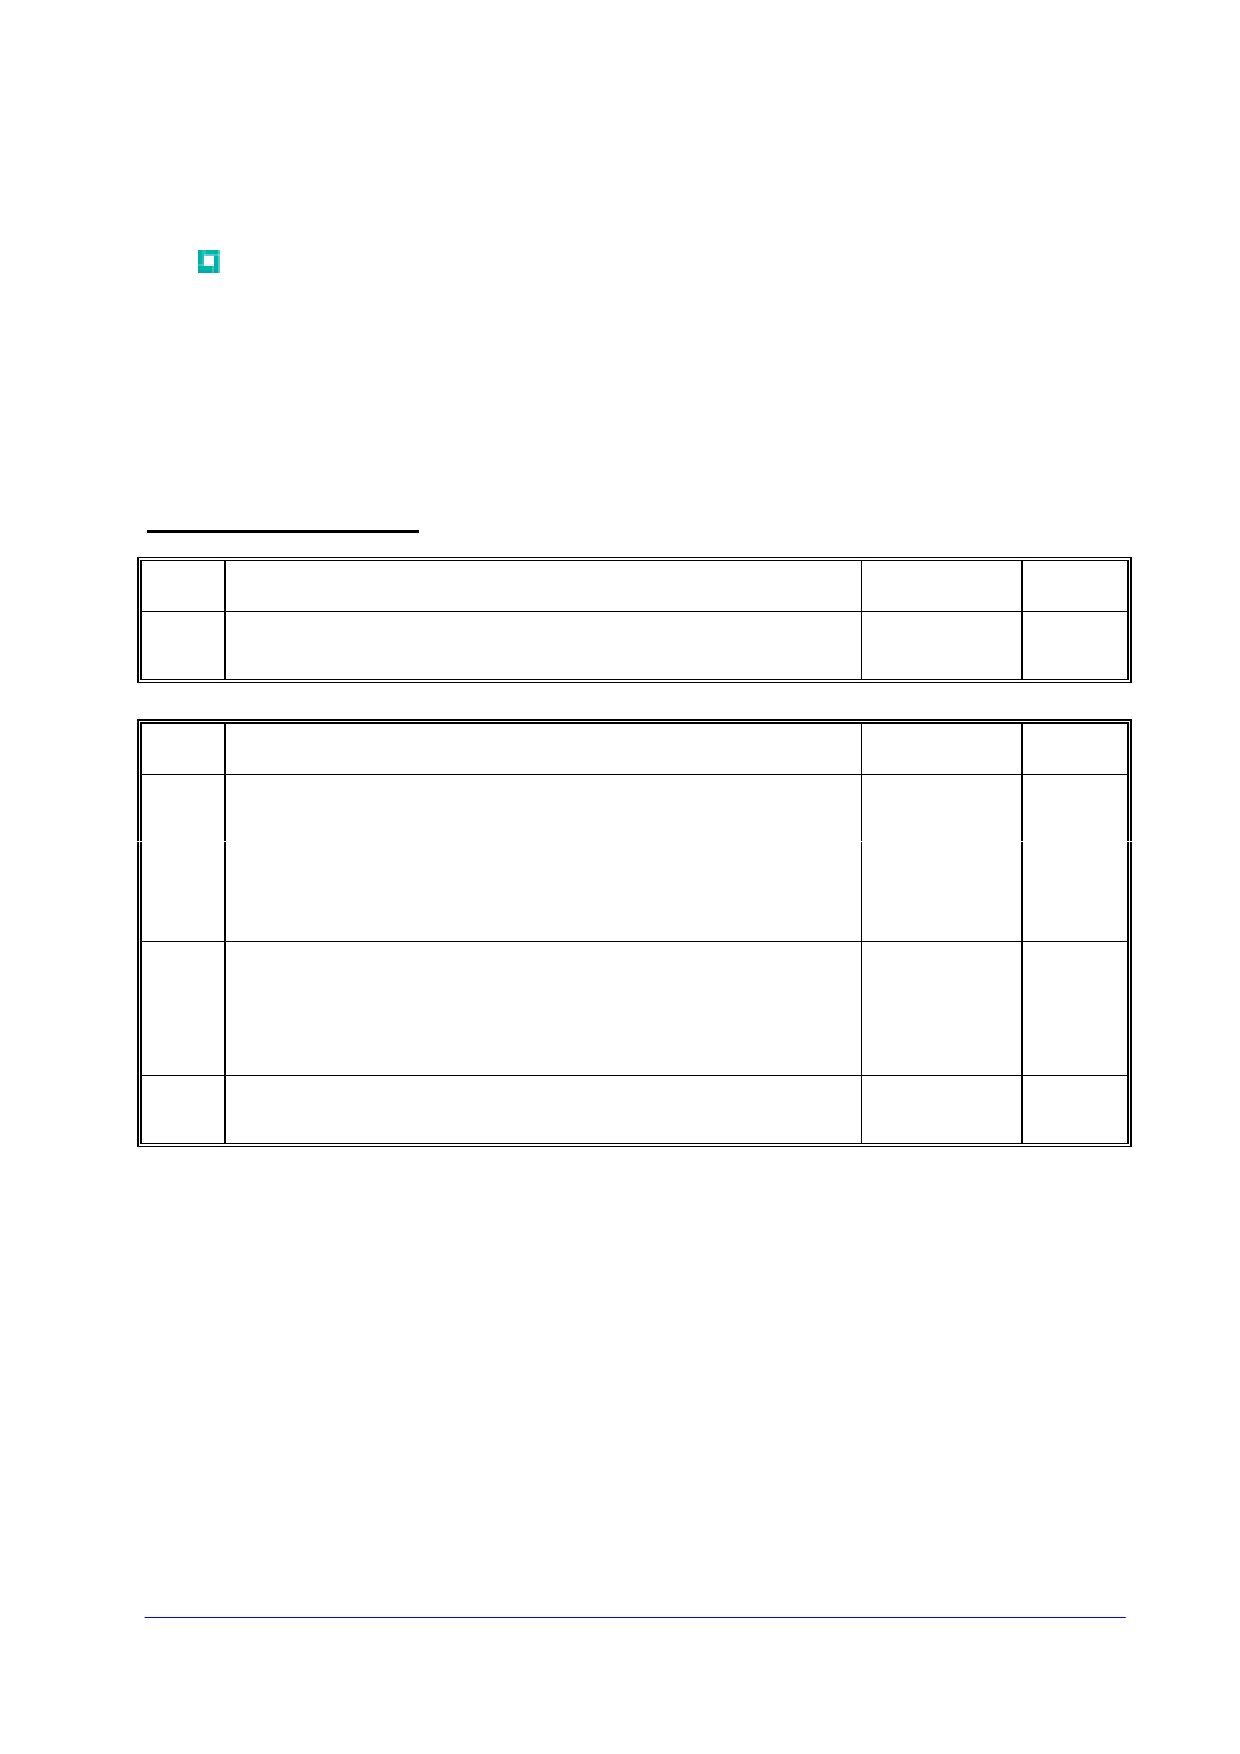 M0358WC120 دیتاشیت PDF